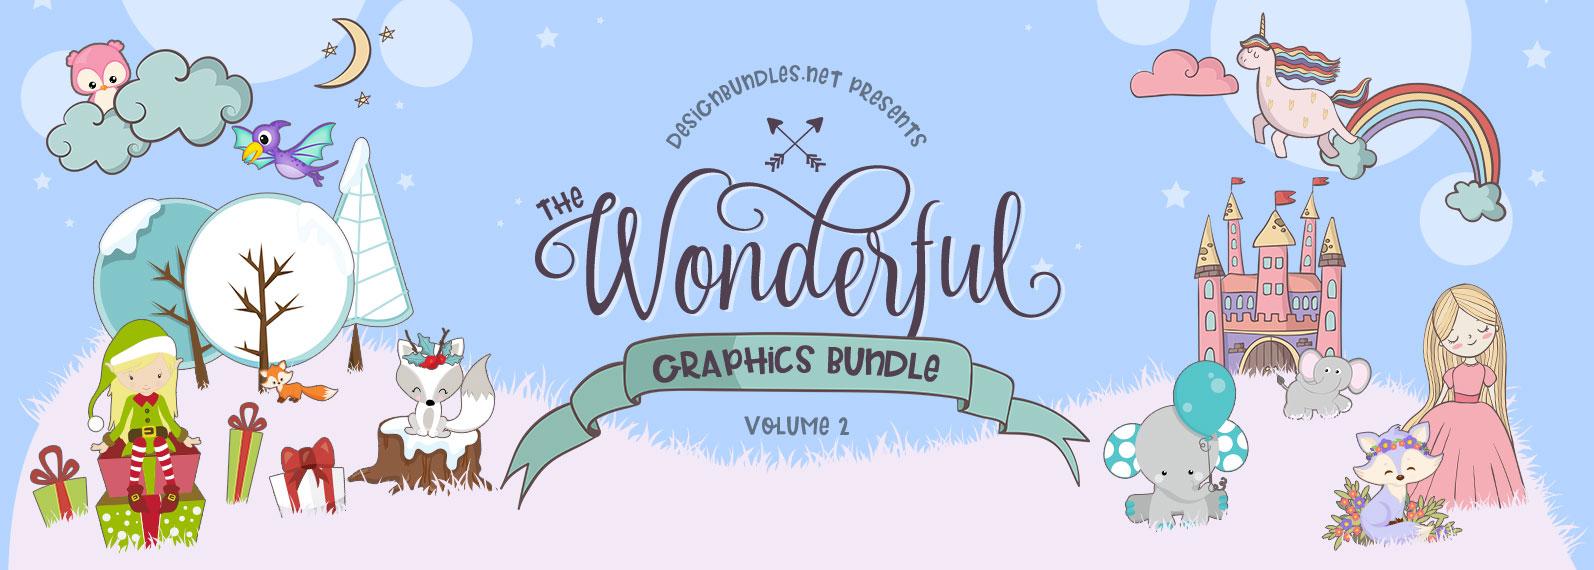 The-Wonderful-Graphics-Bundle-Vol2-cover.jpg